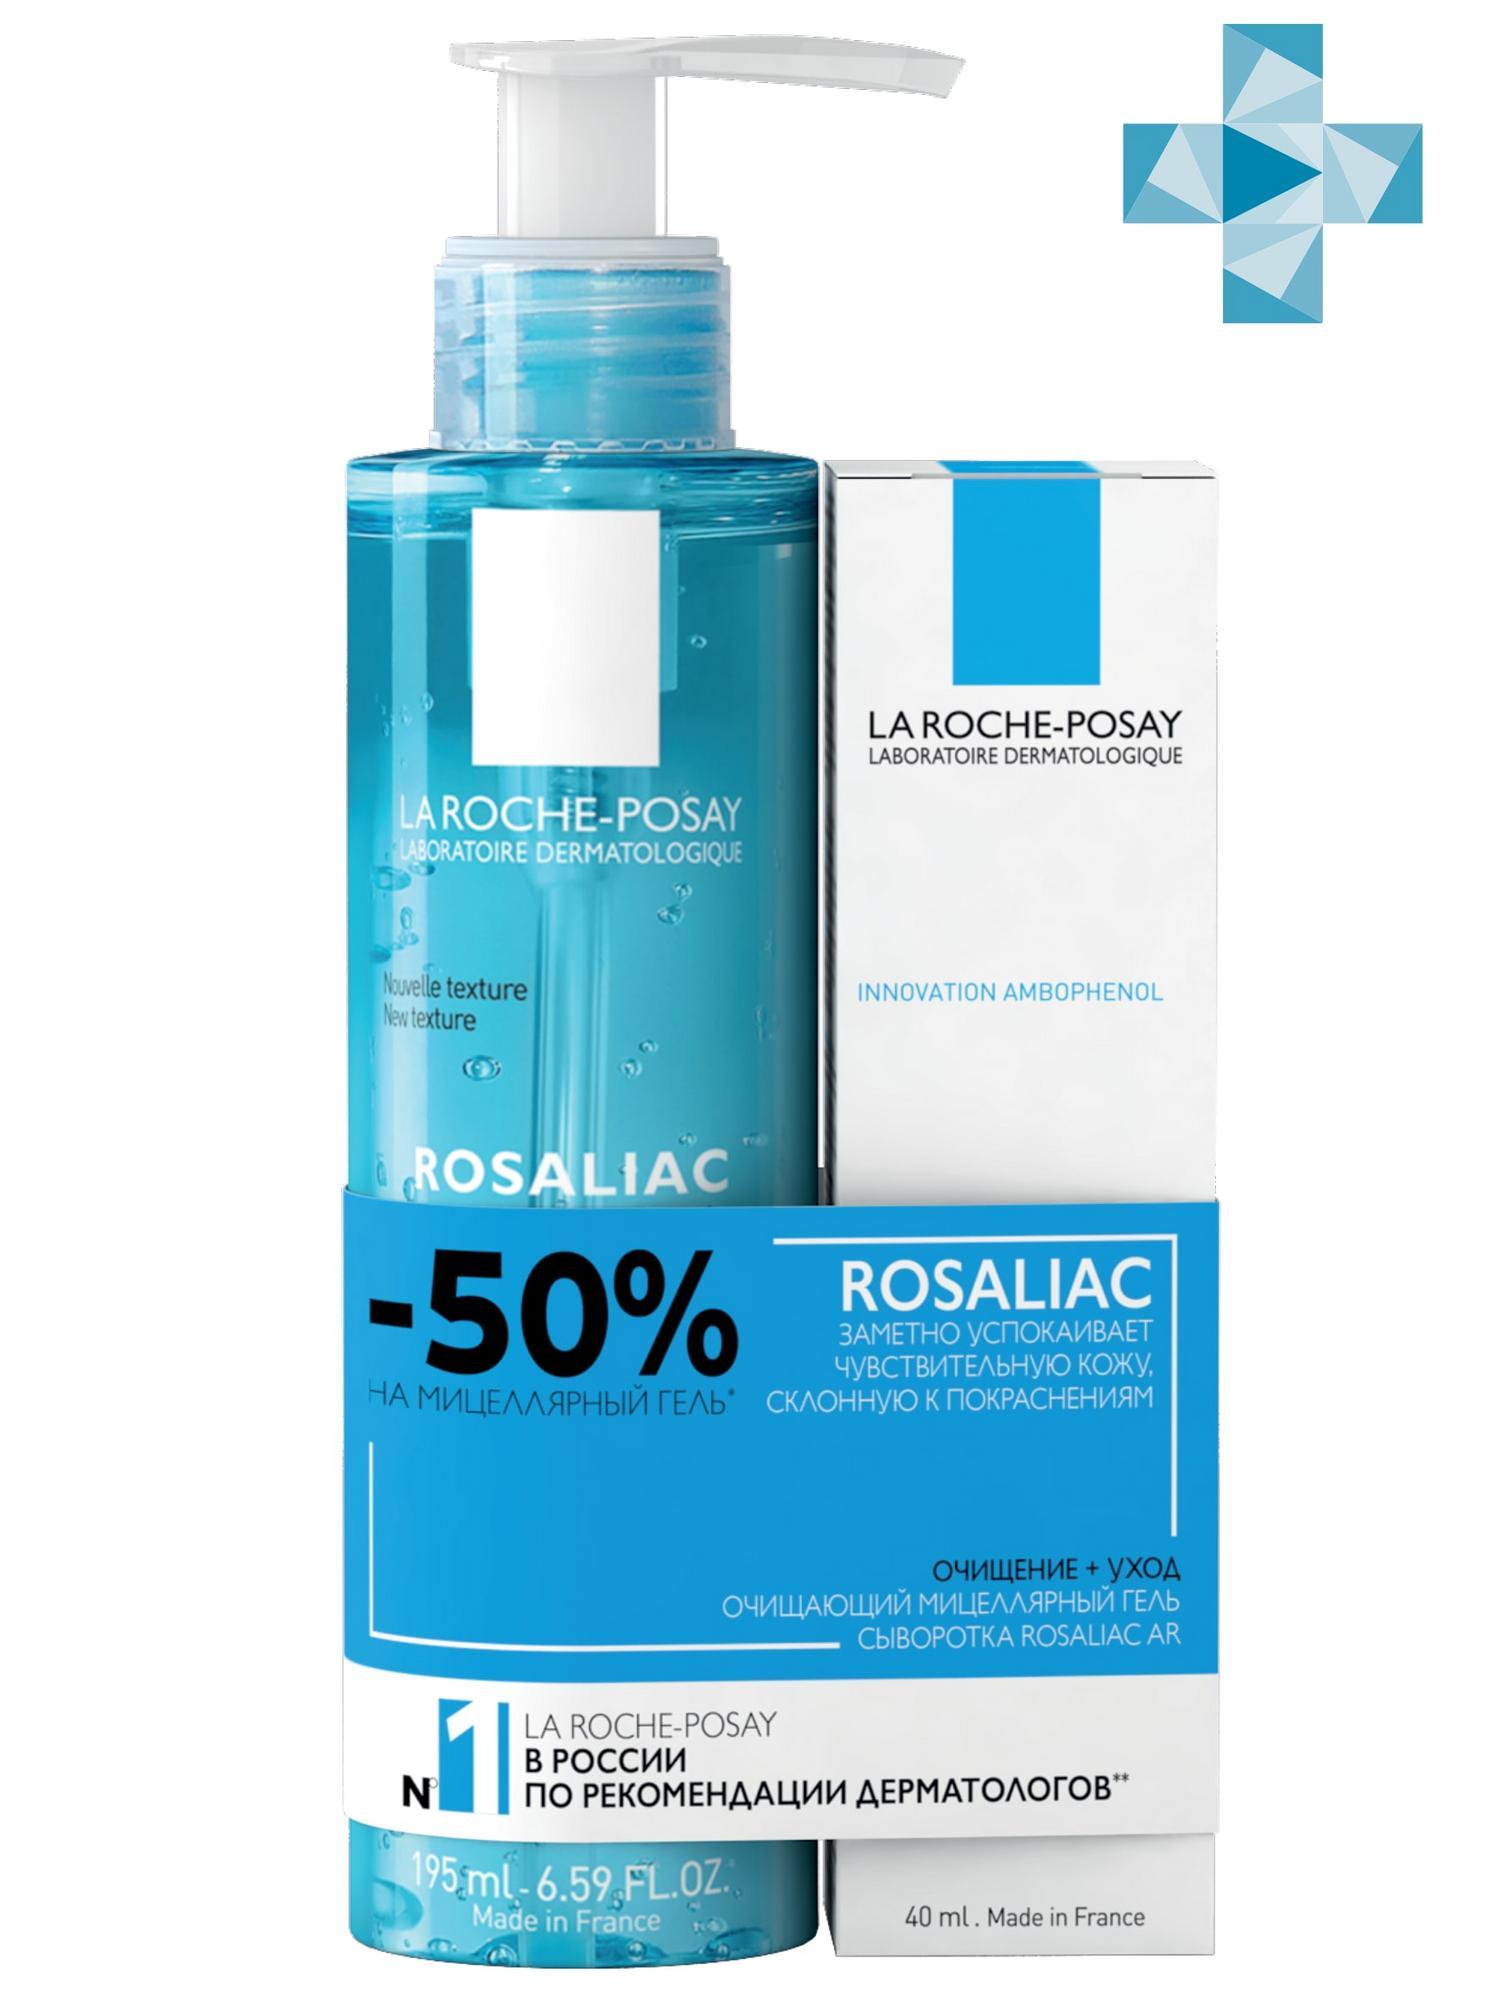 Купить La Roche-Posay Набор: Розалиак АР интенсивная сыворотка 40 мл + Розалиак мицеллярный гель 195 мл (La Roche-Posay, Rosaliac), Франция